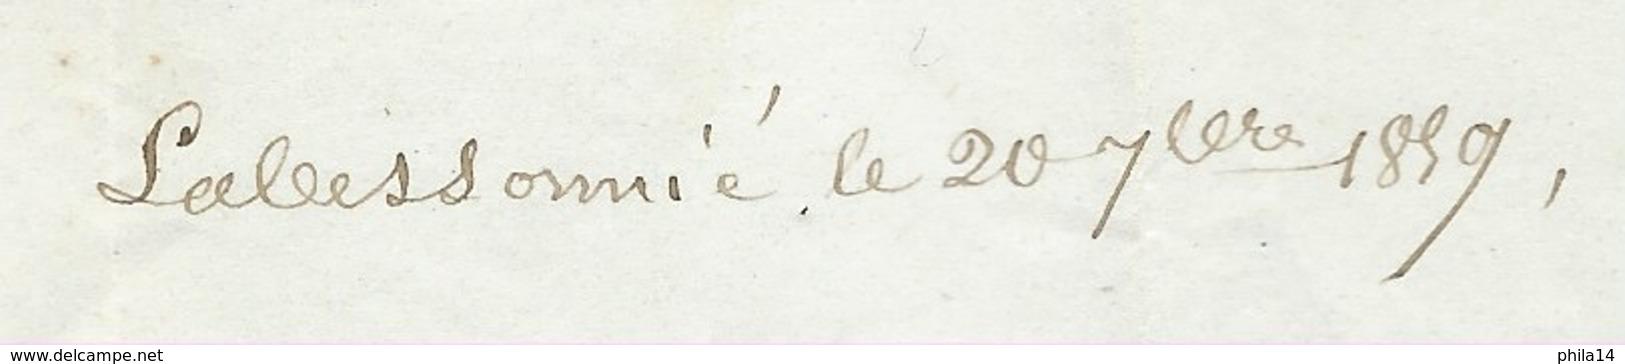 MARQUE POSTALE MONTREDON LABESSONNIE TARN POUR MONTAUBAN / 1857 TAXE 30 DOUBLE TRAIT - Postmark Collection (Covers)